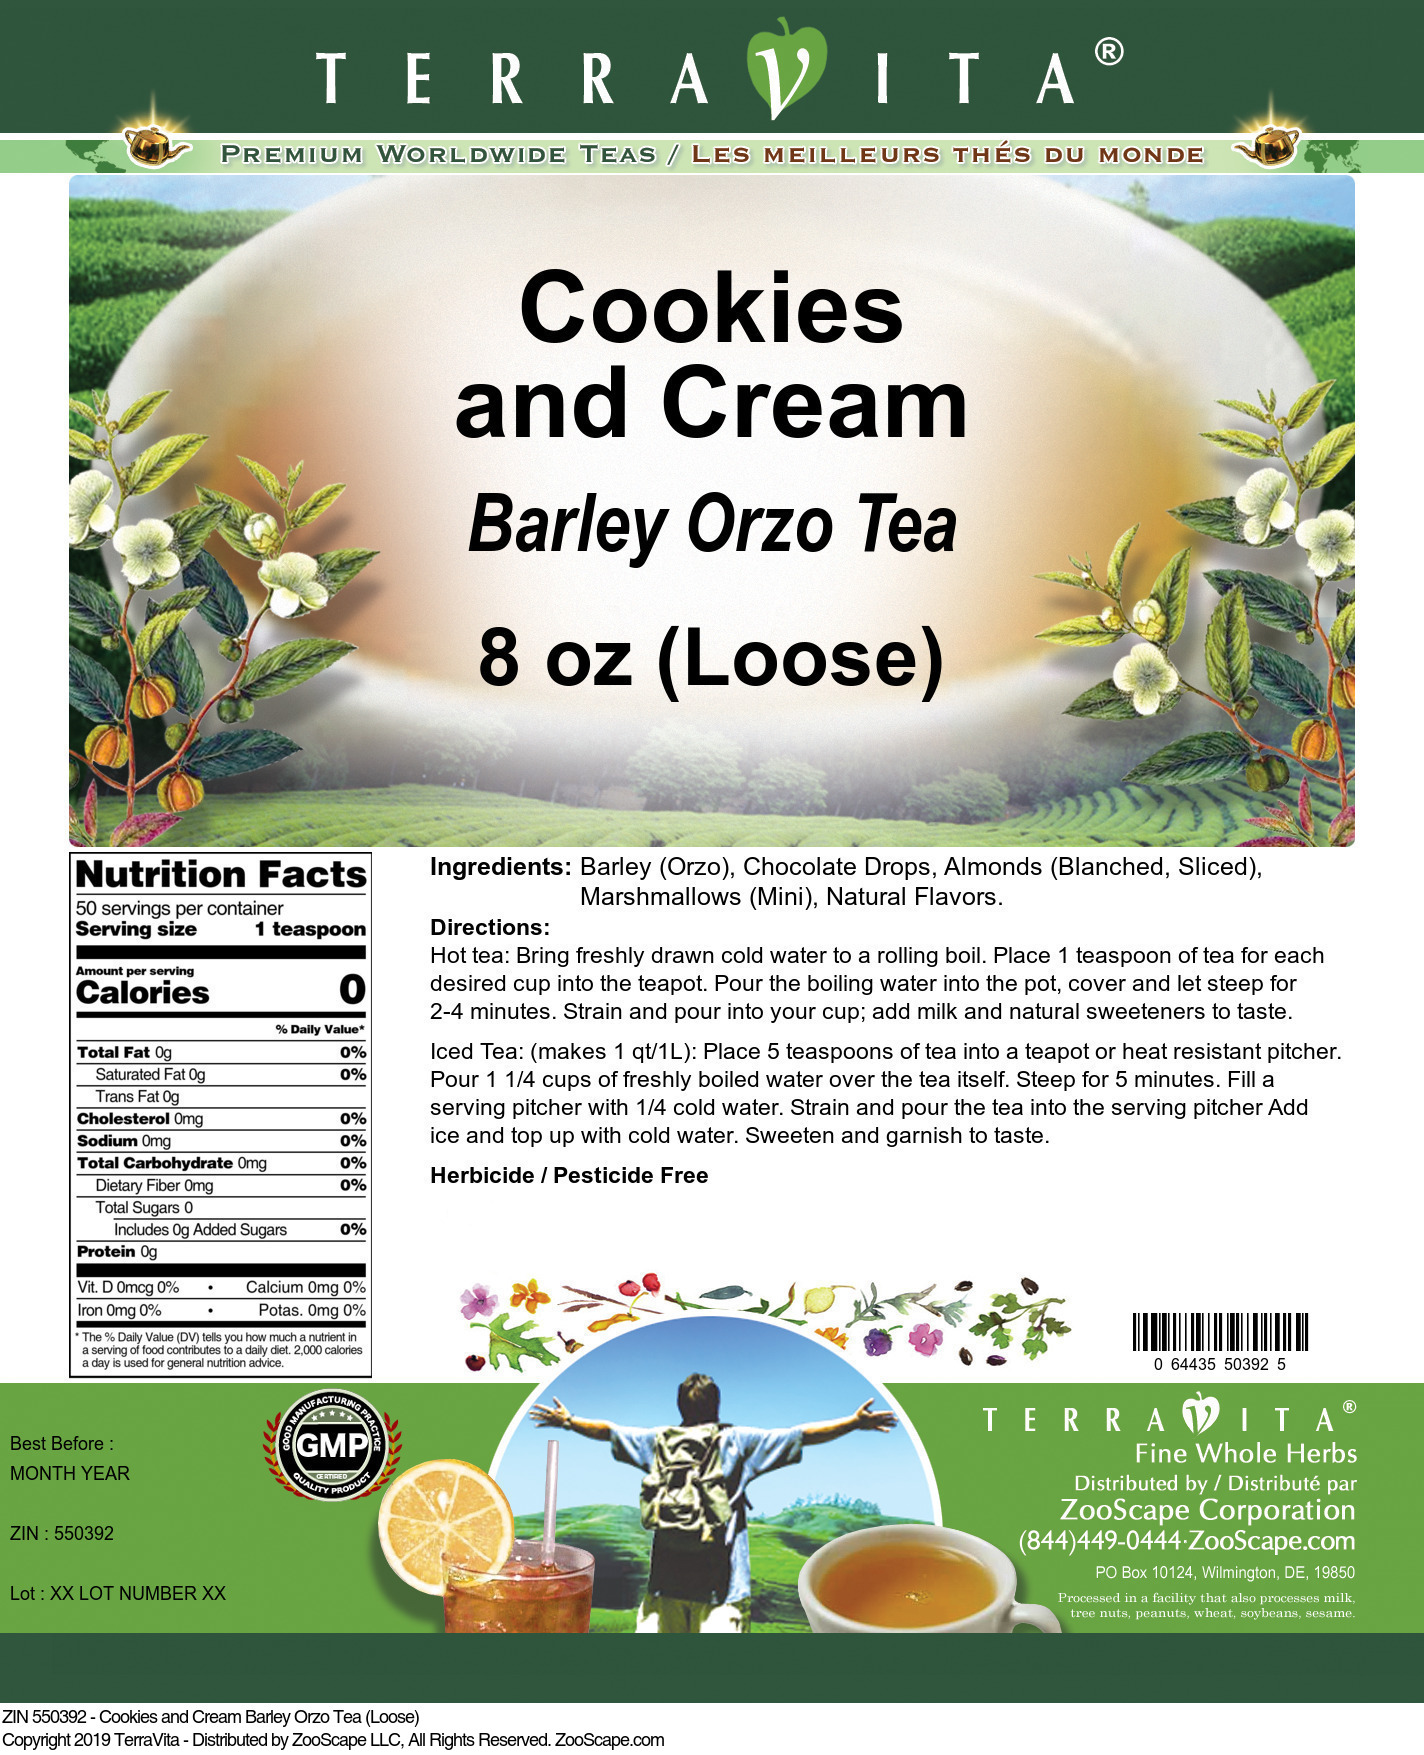 Cookies and Cream Barley Orzo Tea (Loose)